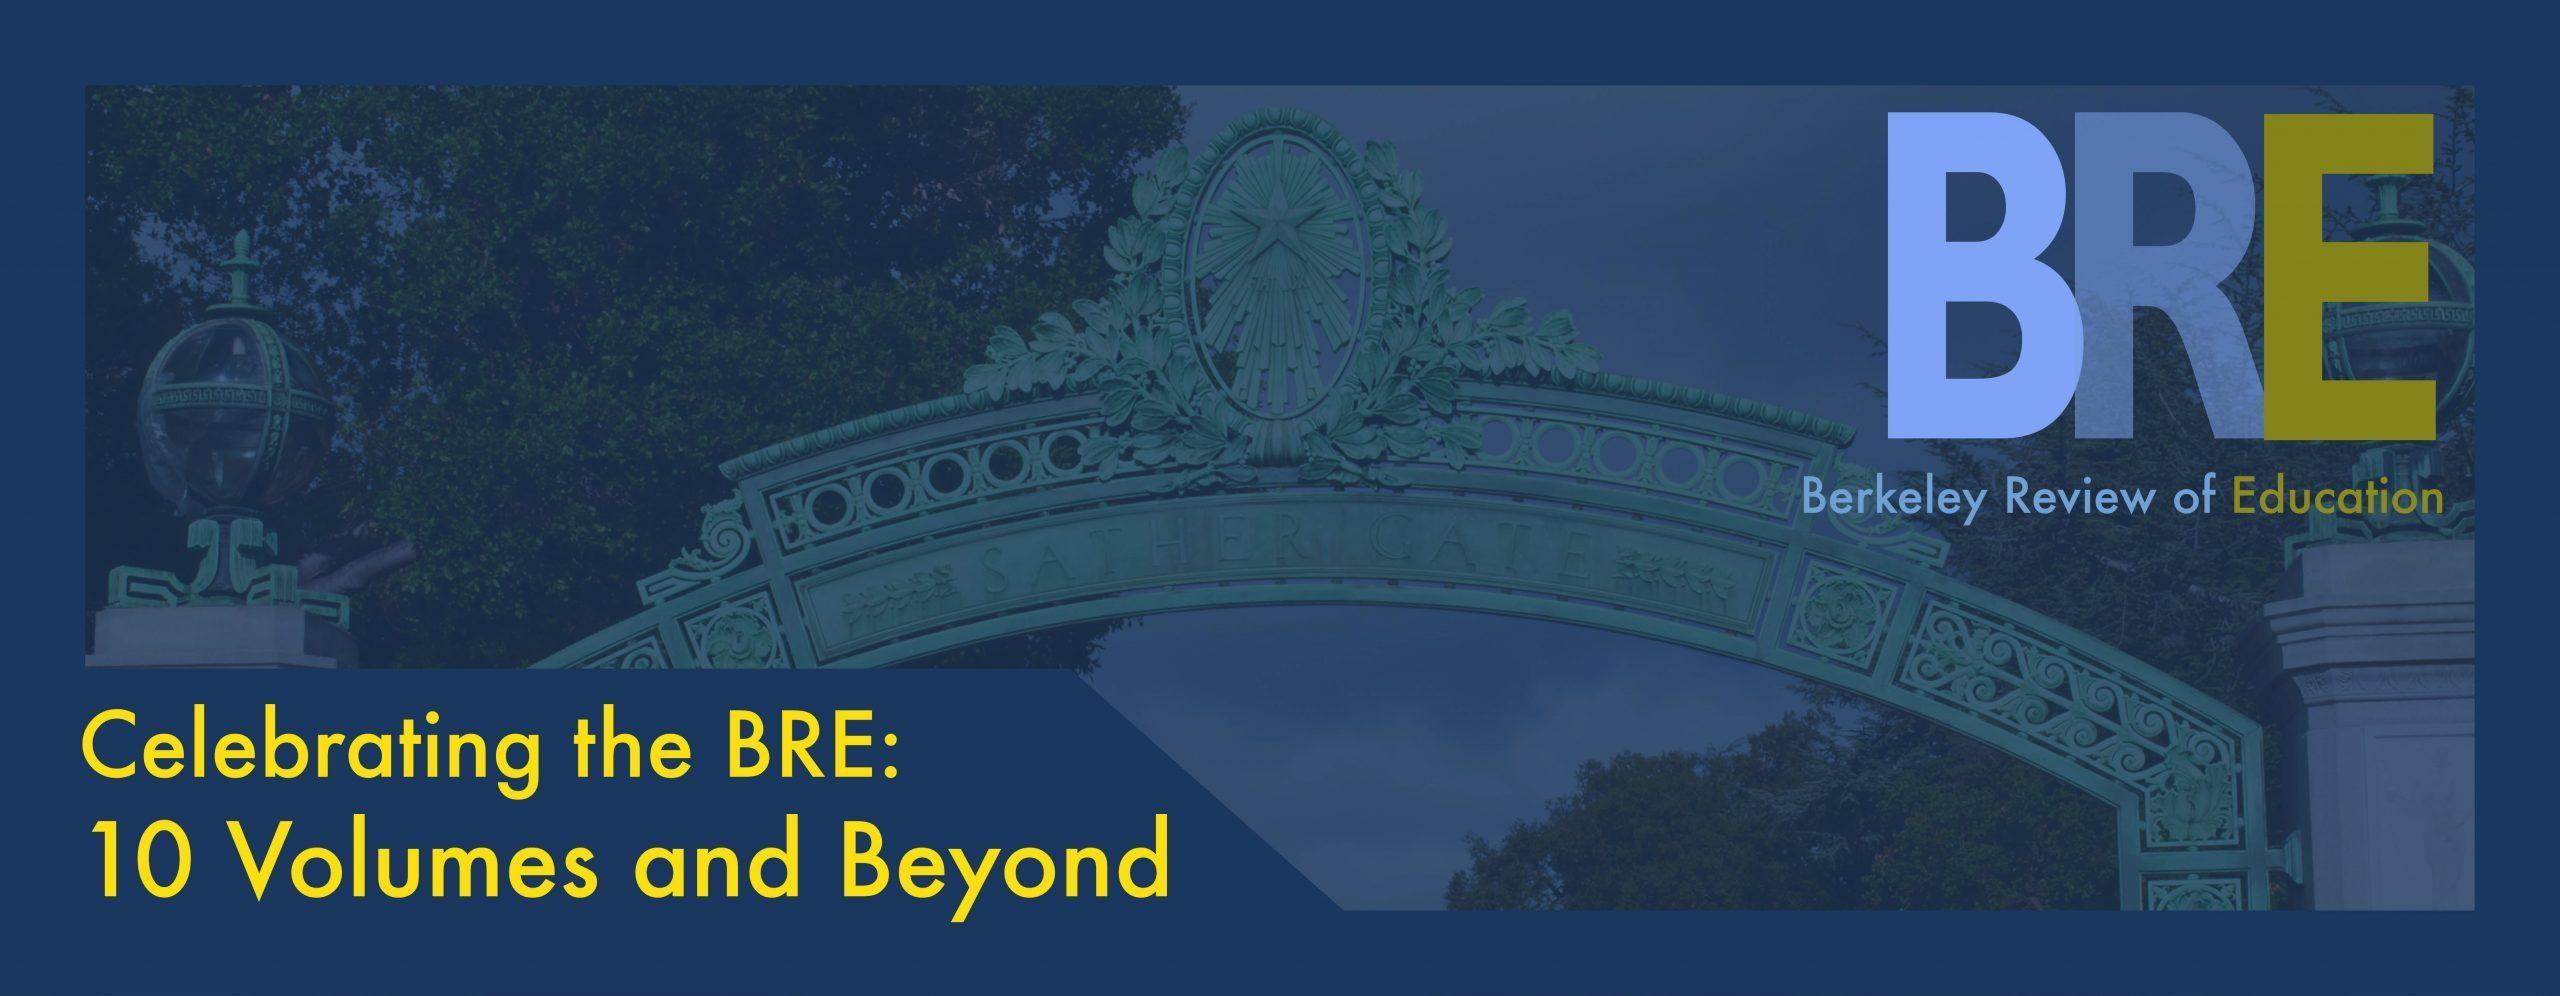 Berkeley Review of Education